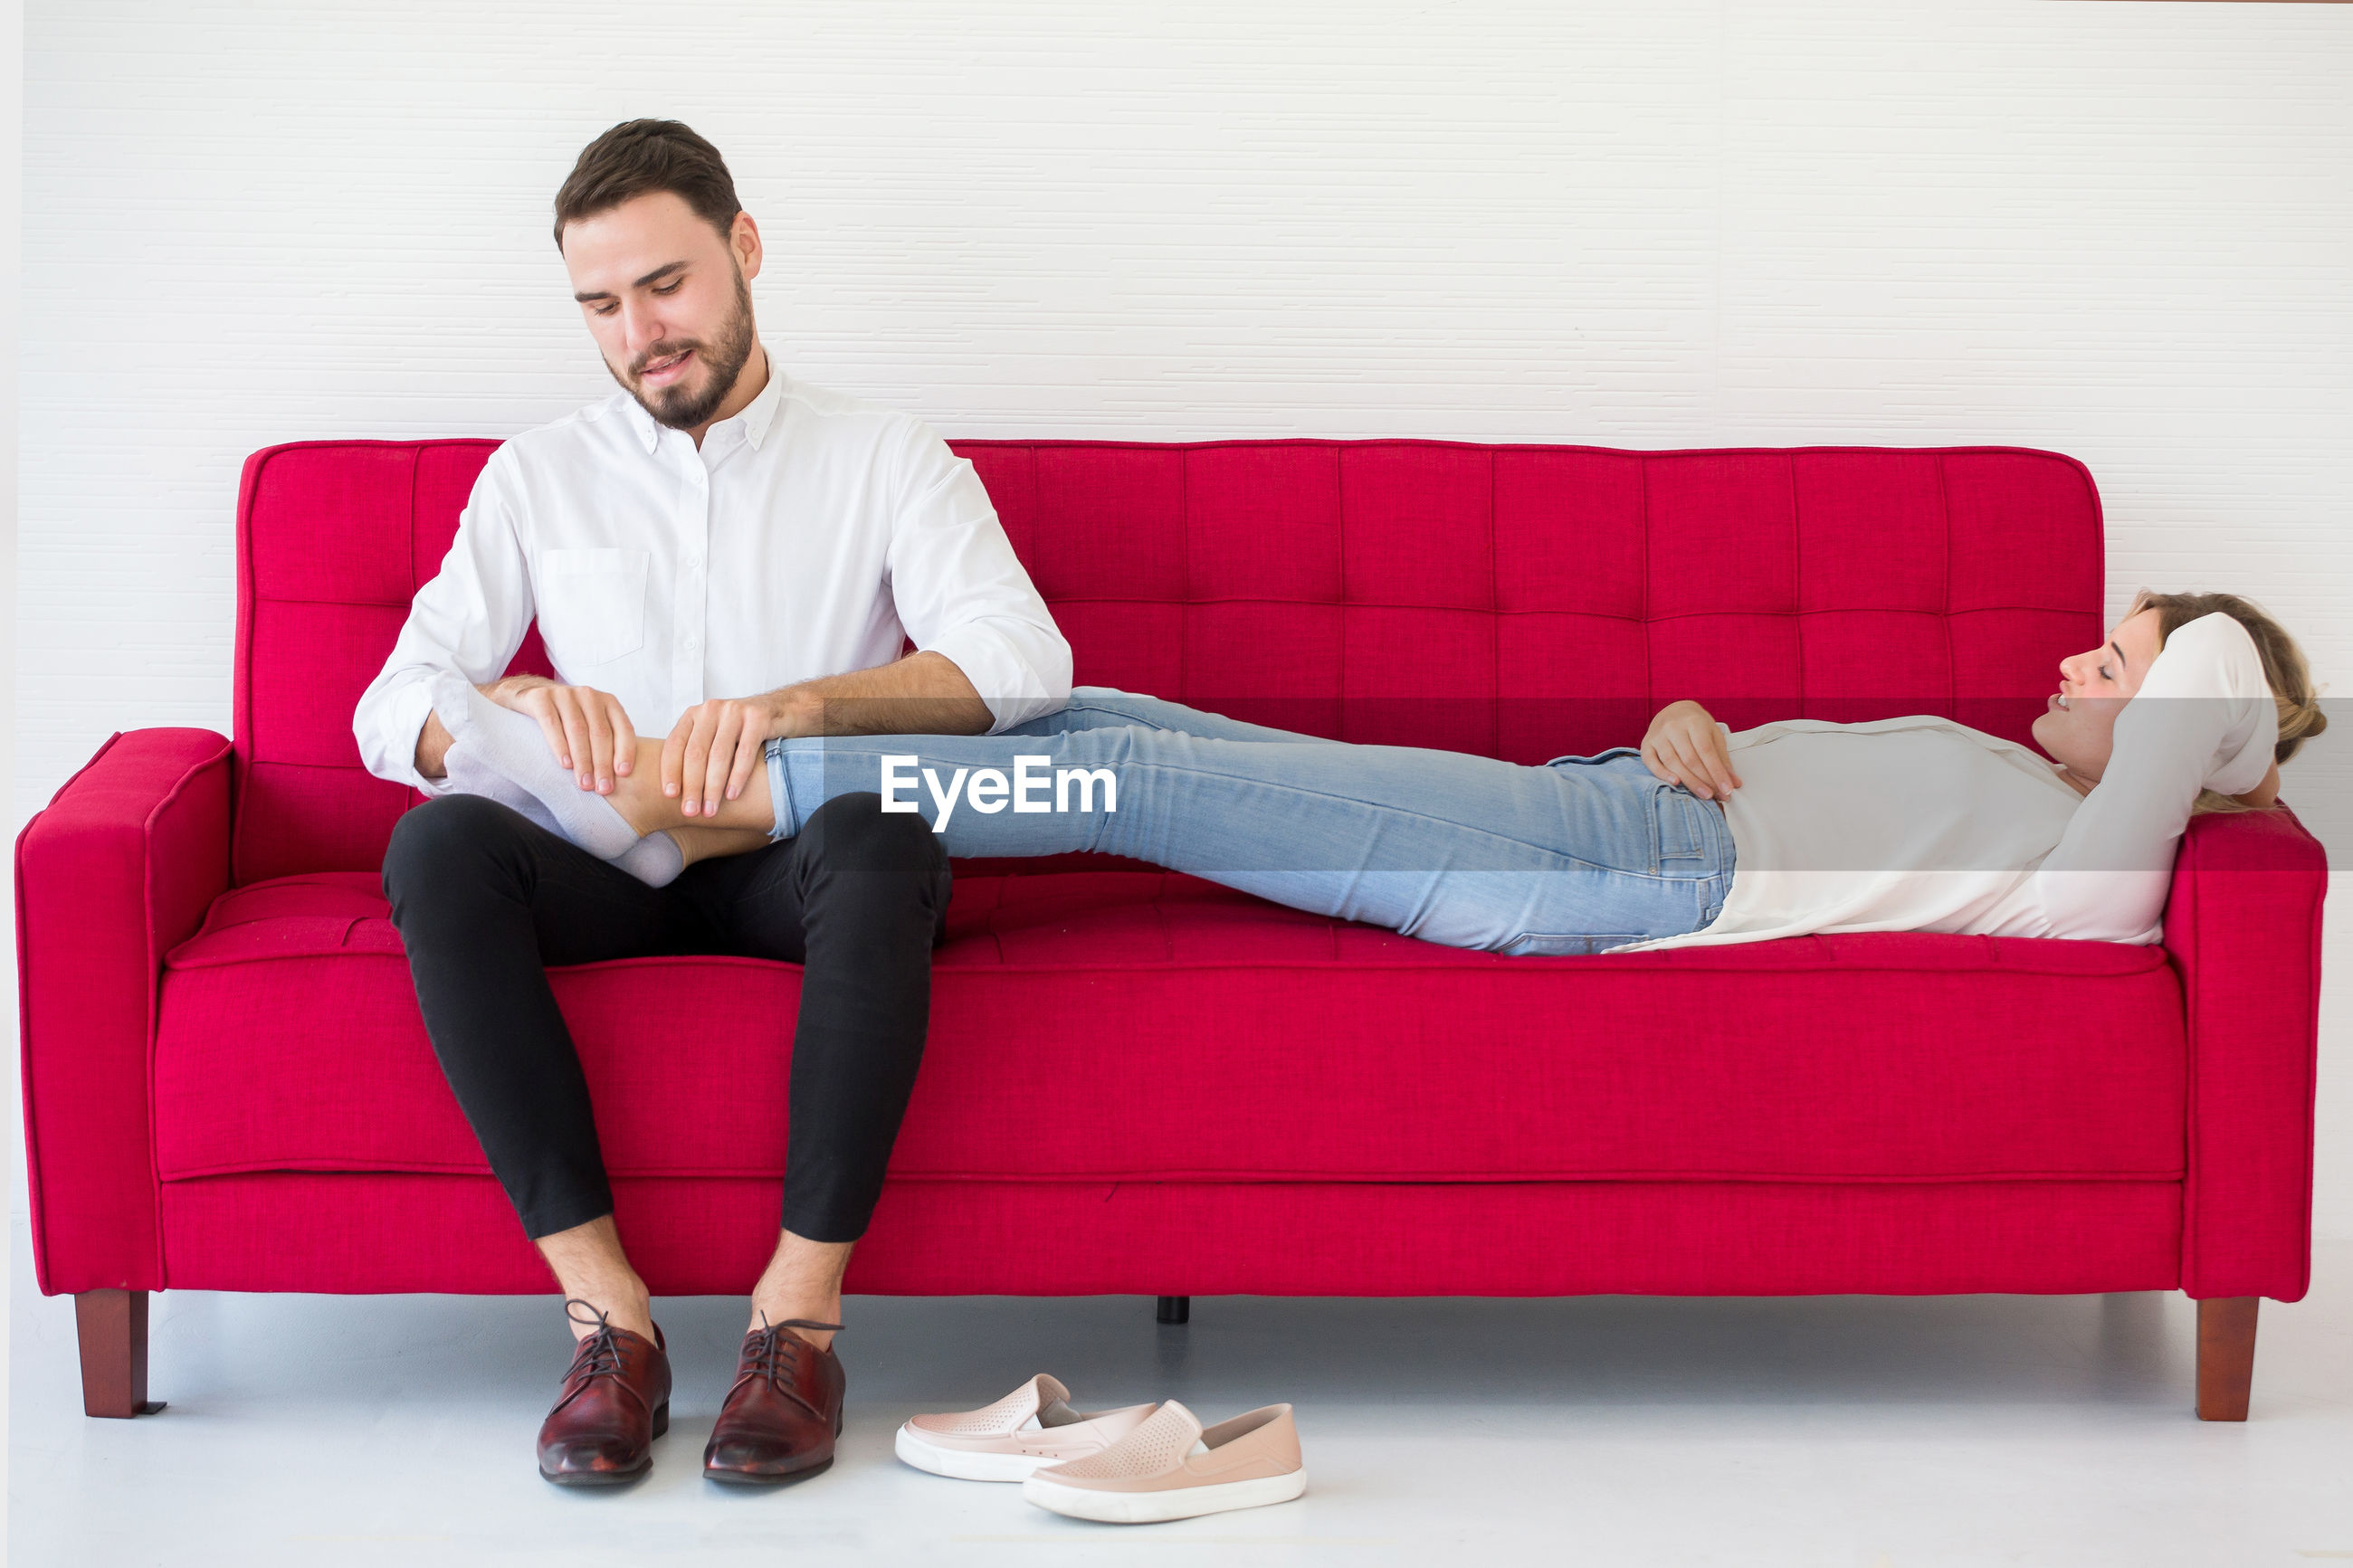 Boyfriend massaging girlfriend foot on sofa against white wall